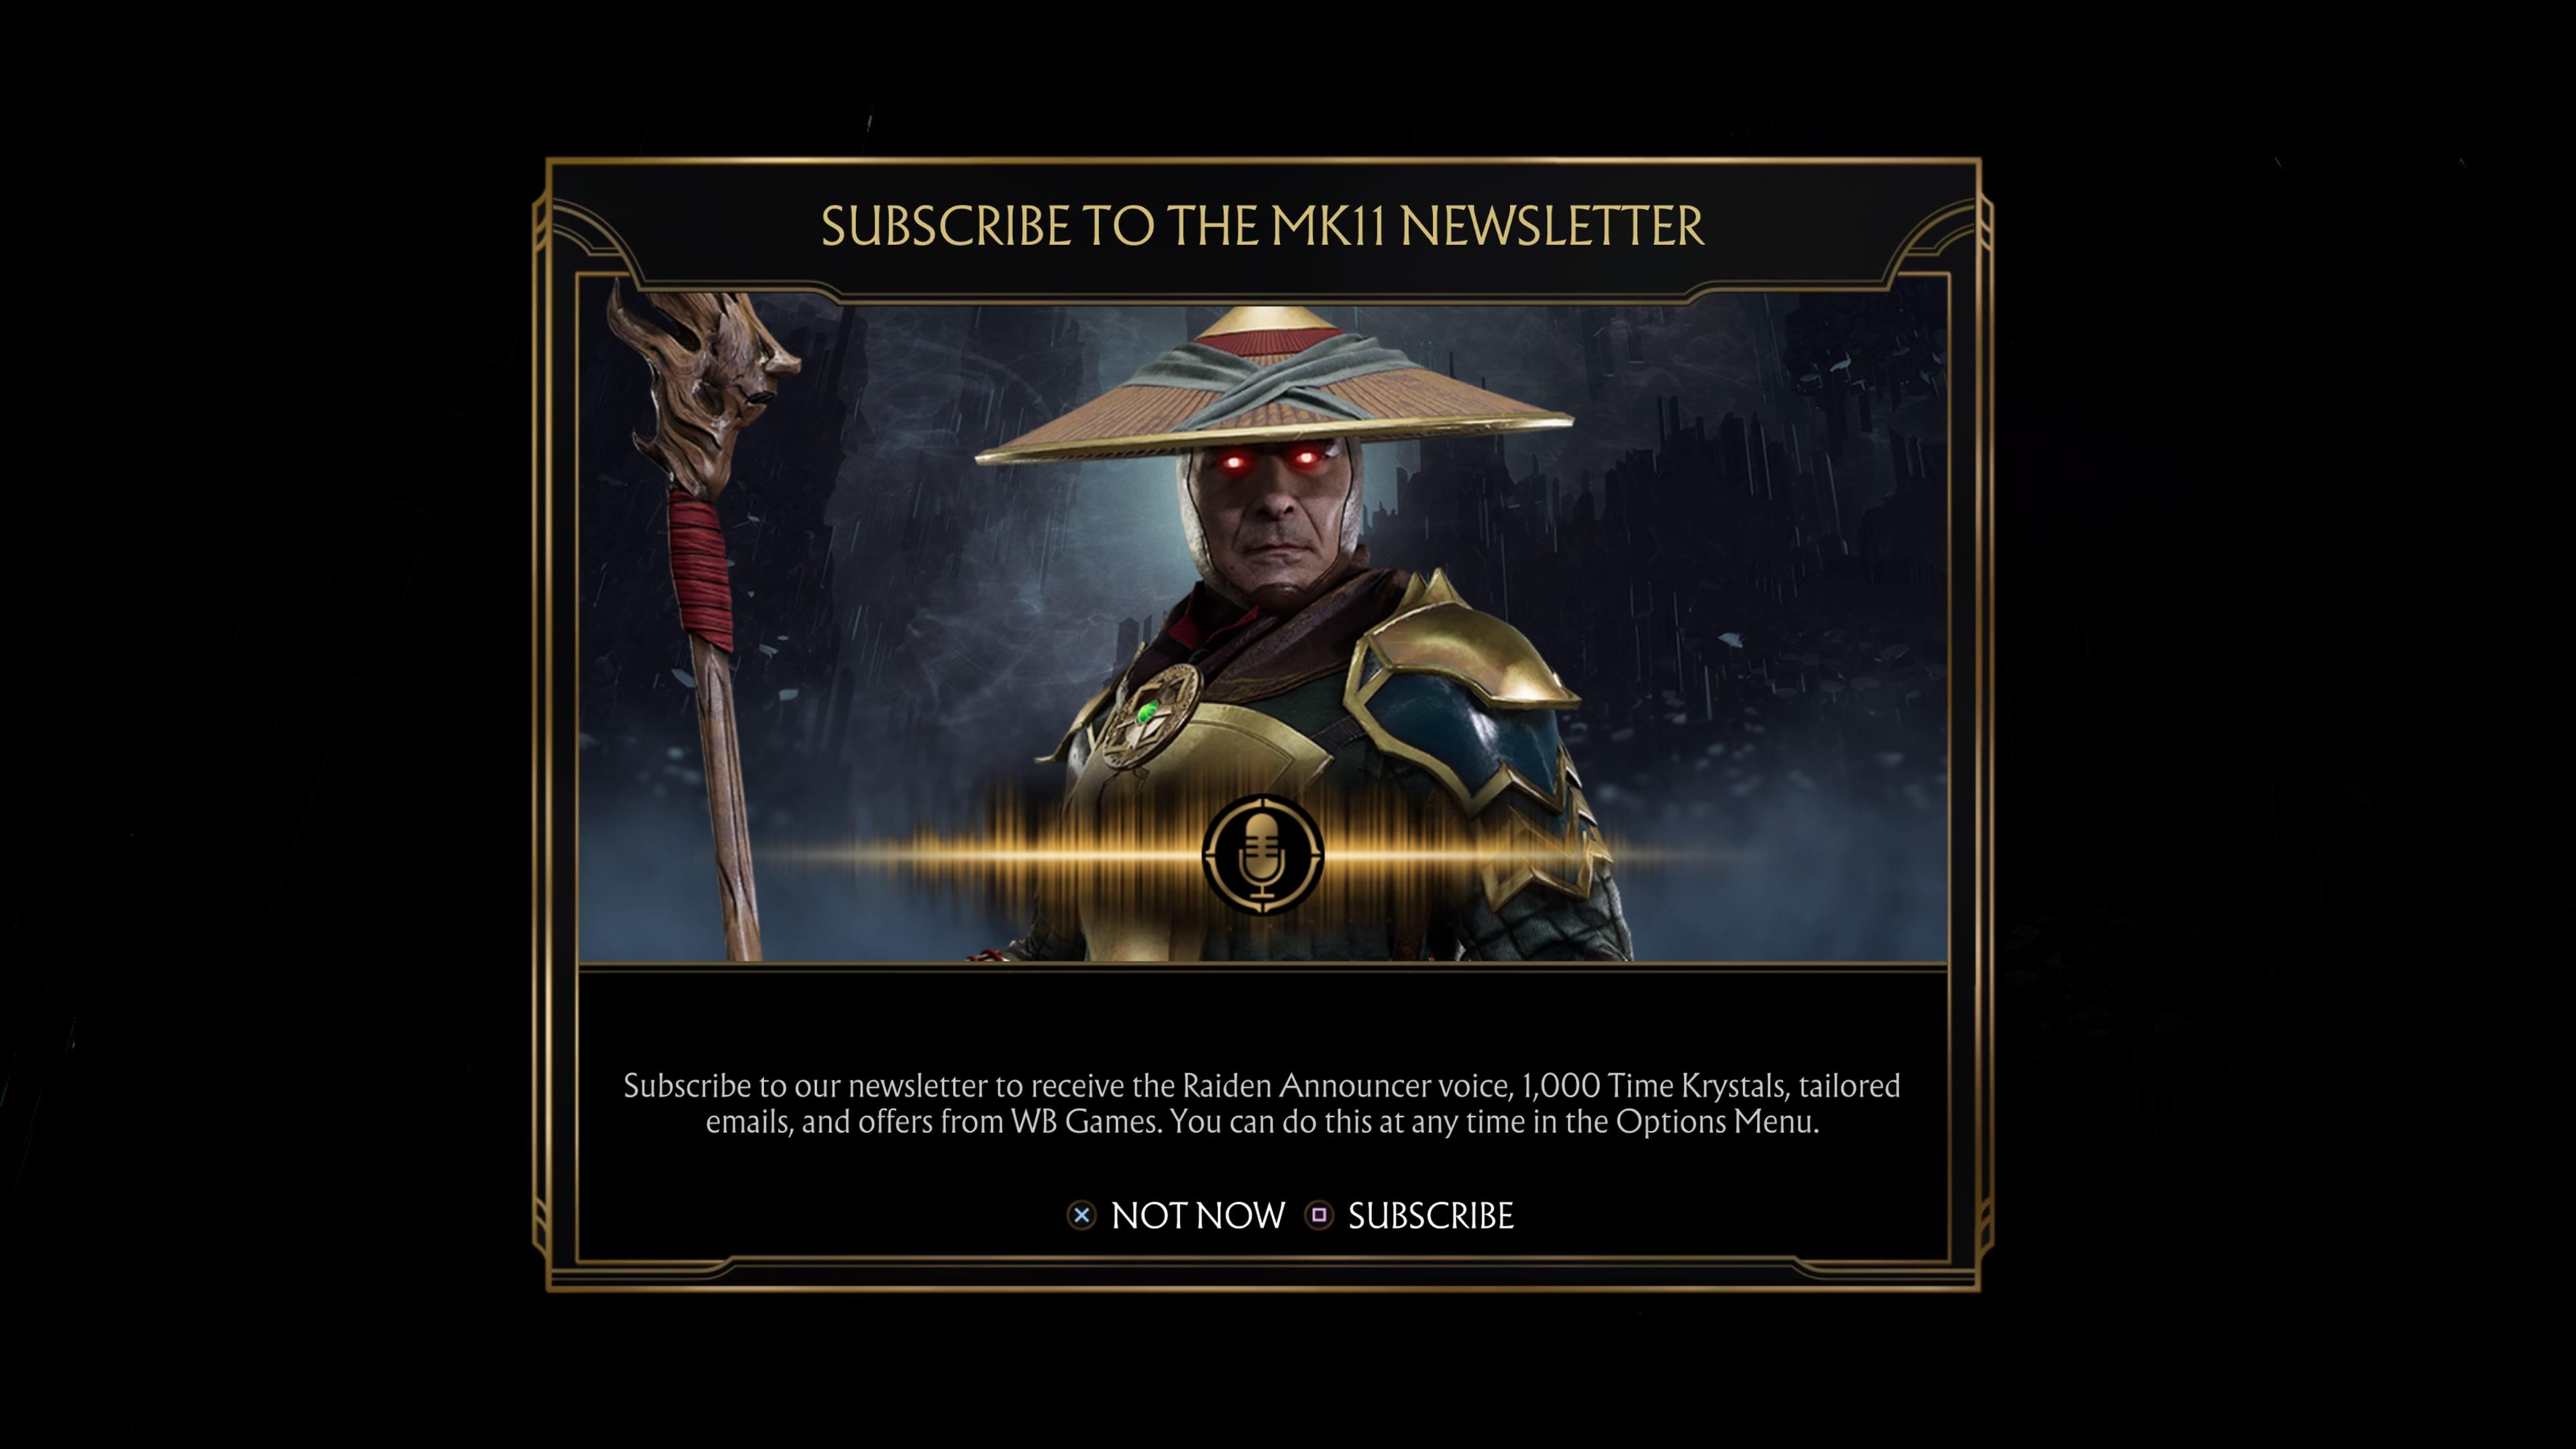 Mortal_Kombat_11_20191212132709.jpg